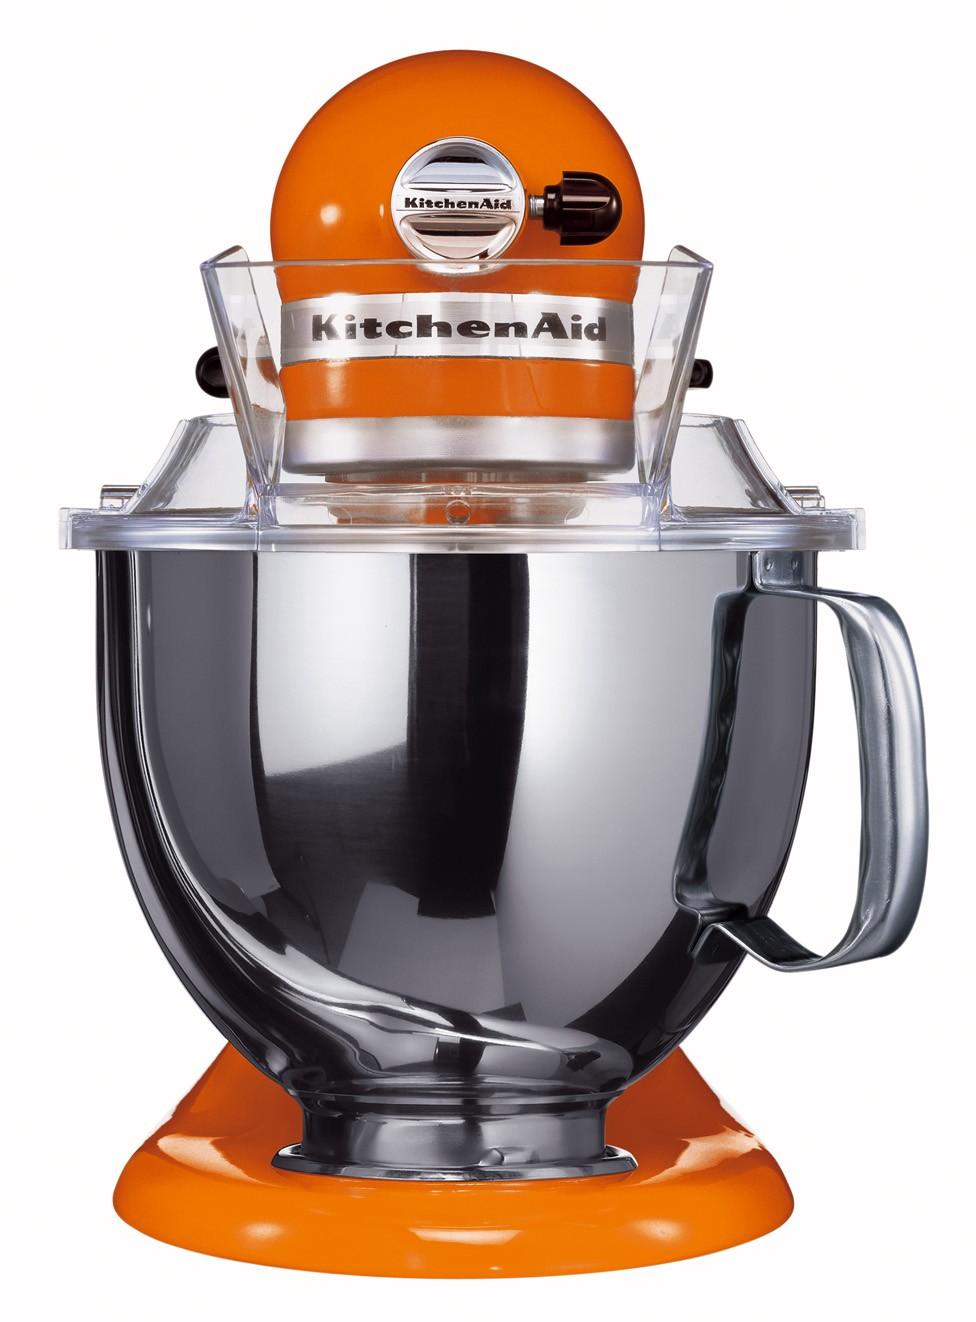 Миксер планетарный KitchenAid Artisan, объем чаши 4,83 л, мандариновый KitchenAid 5KSM150PSETG фото 1